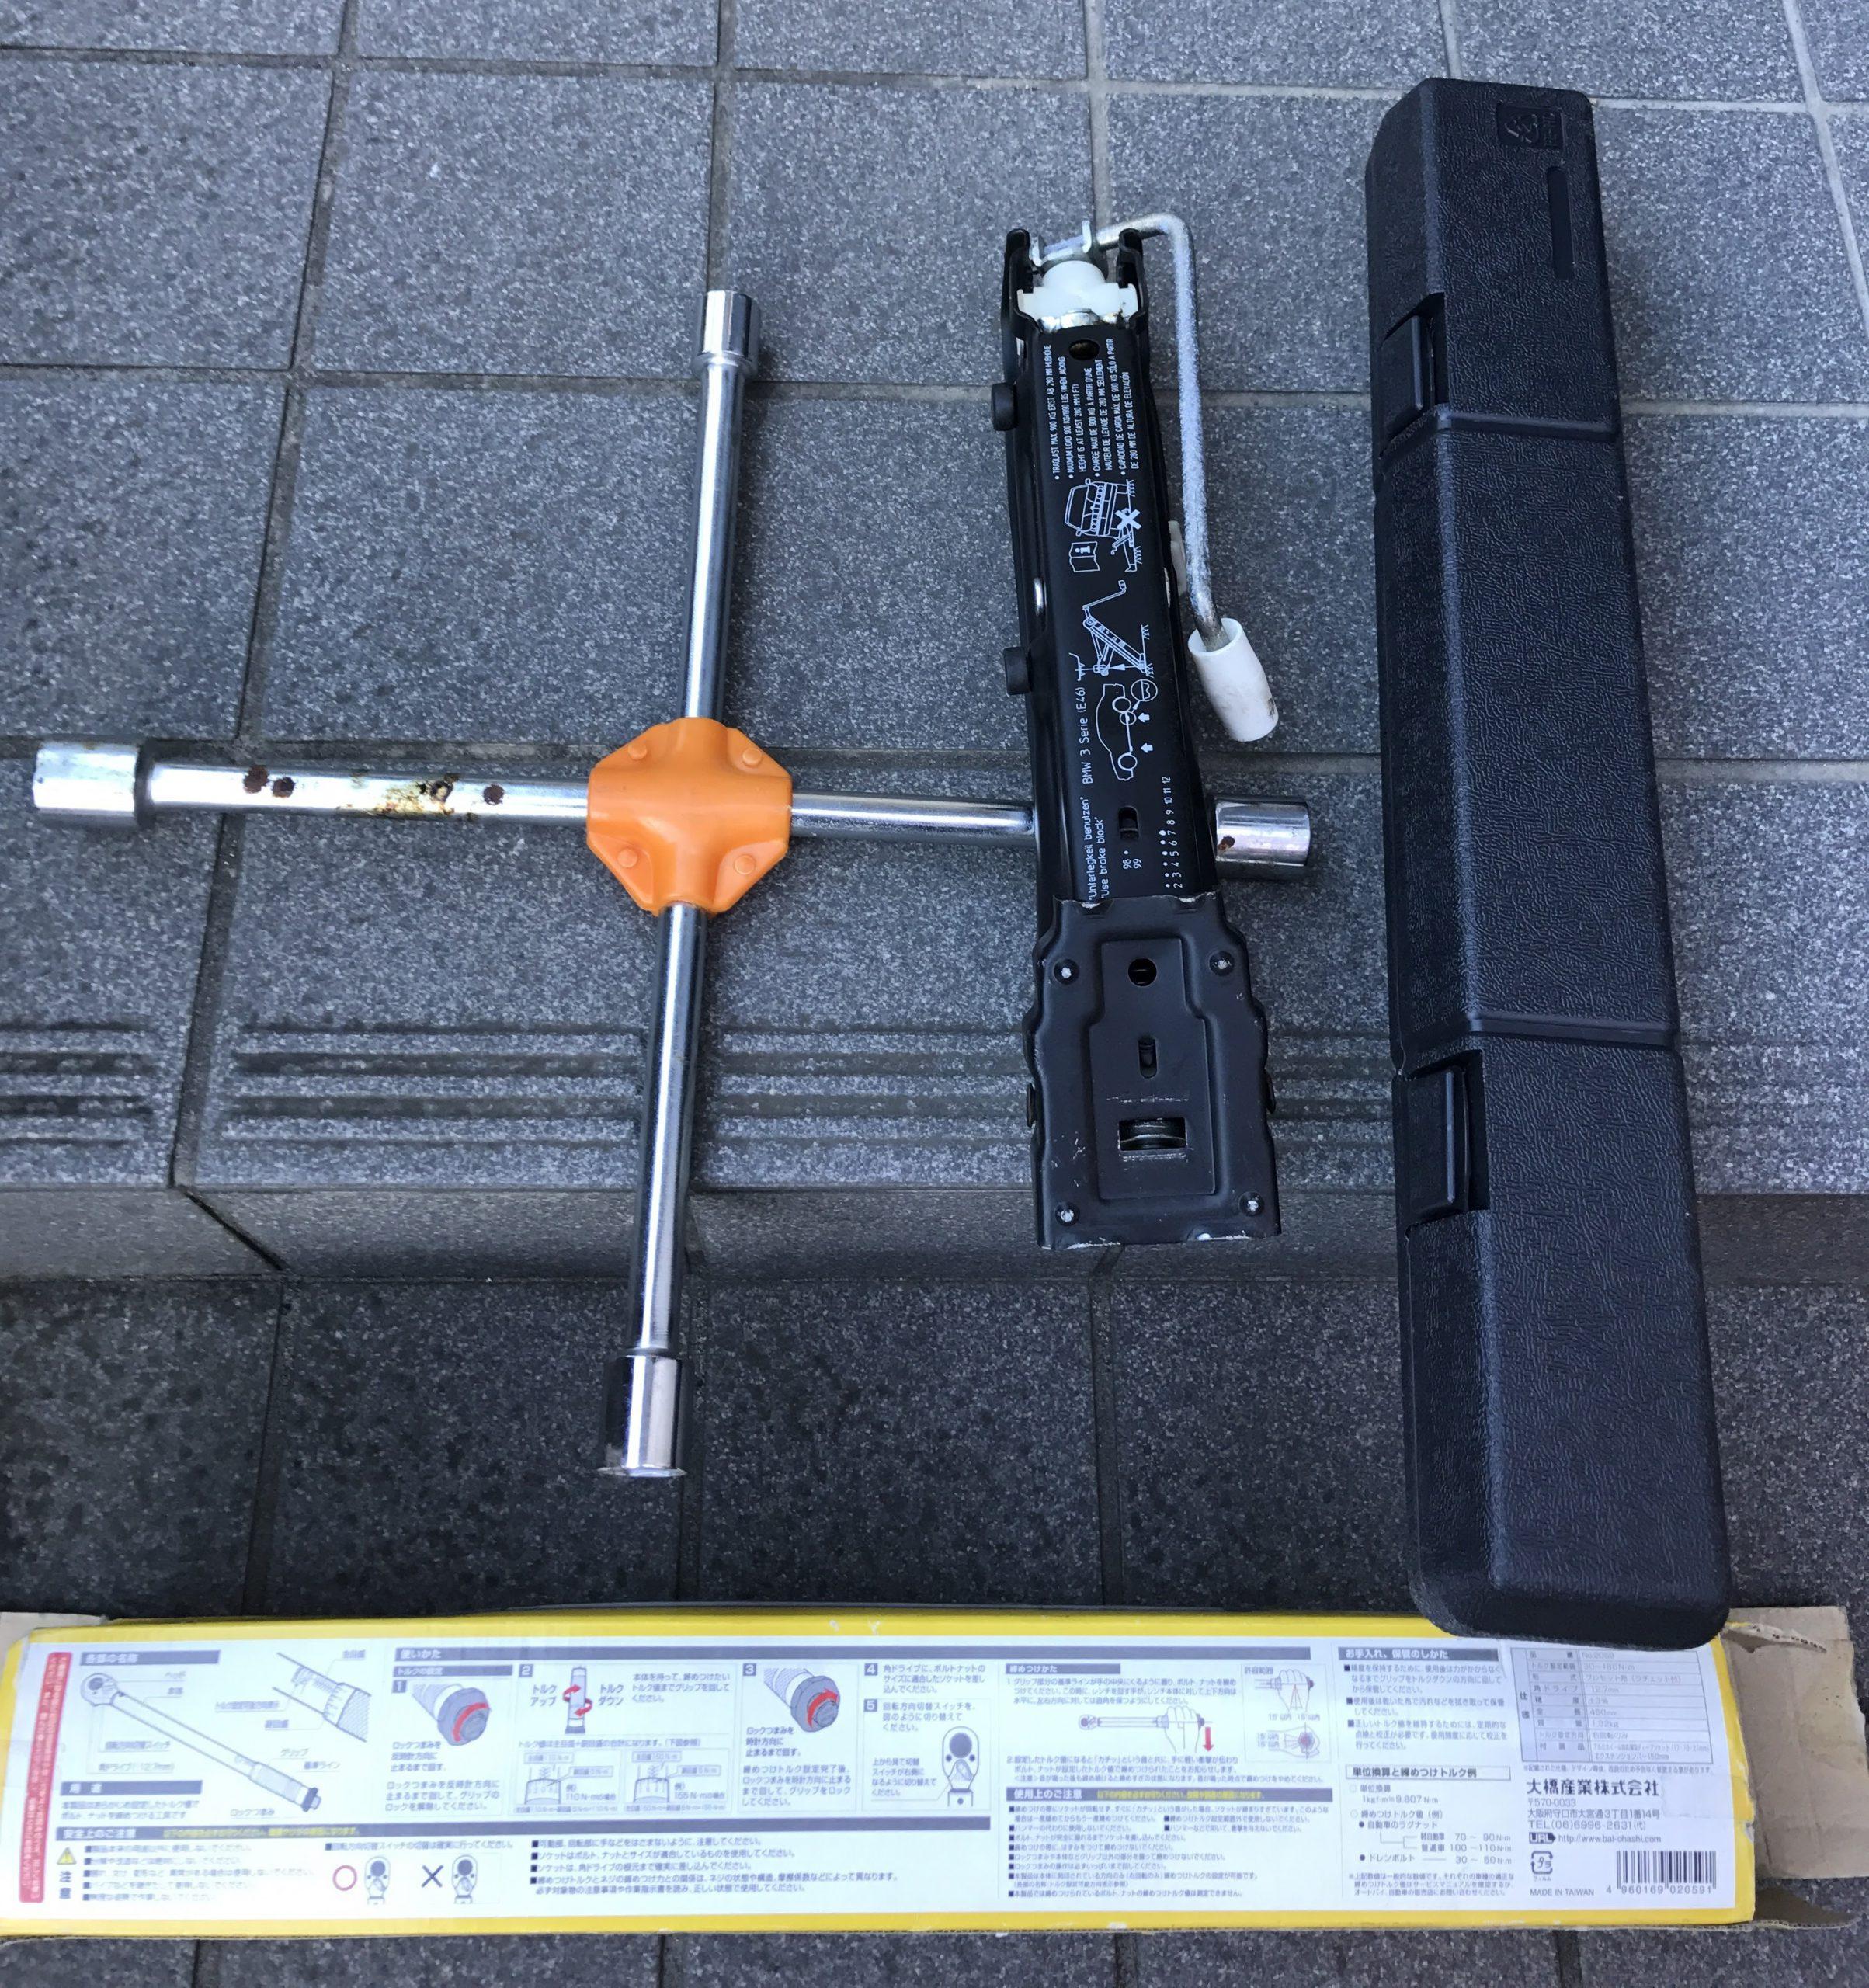 BMW4シリーズグランクーペの冬支度スタッドレスタイヤに交換:準備編【必要な工具、締め付け推奨トルクなど】